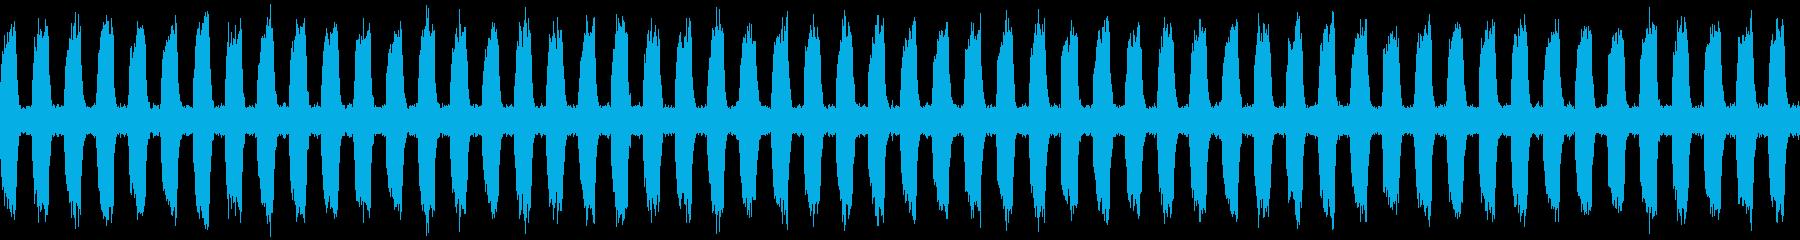 SF_緊急事態_警報_エマージェンシー2の再生済みの波形